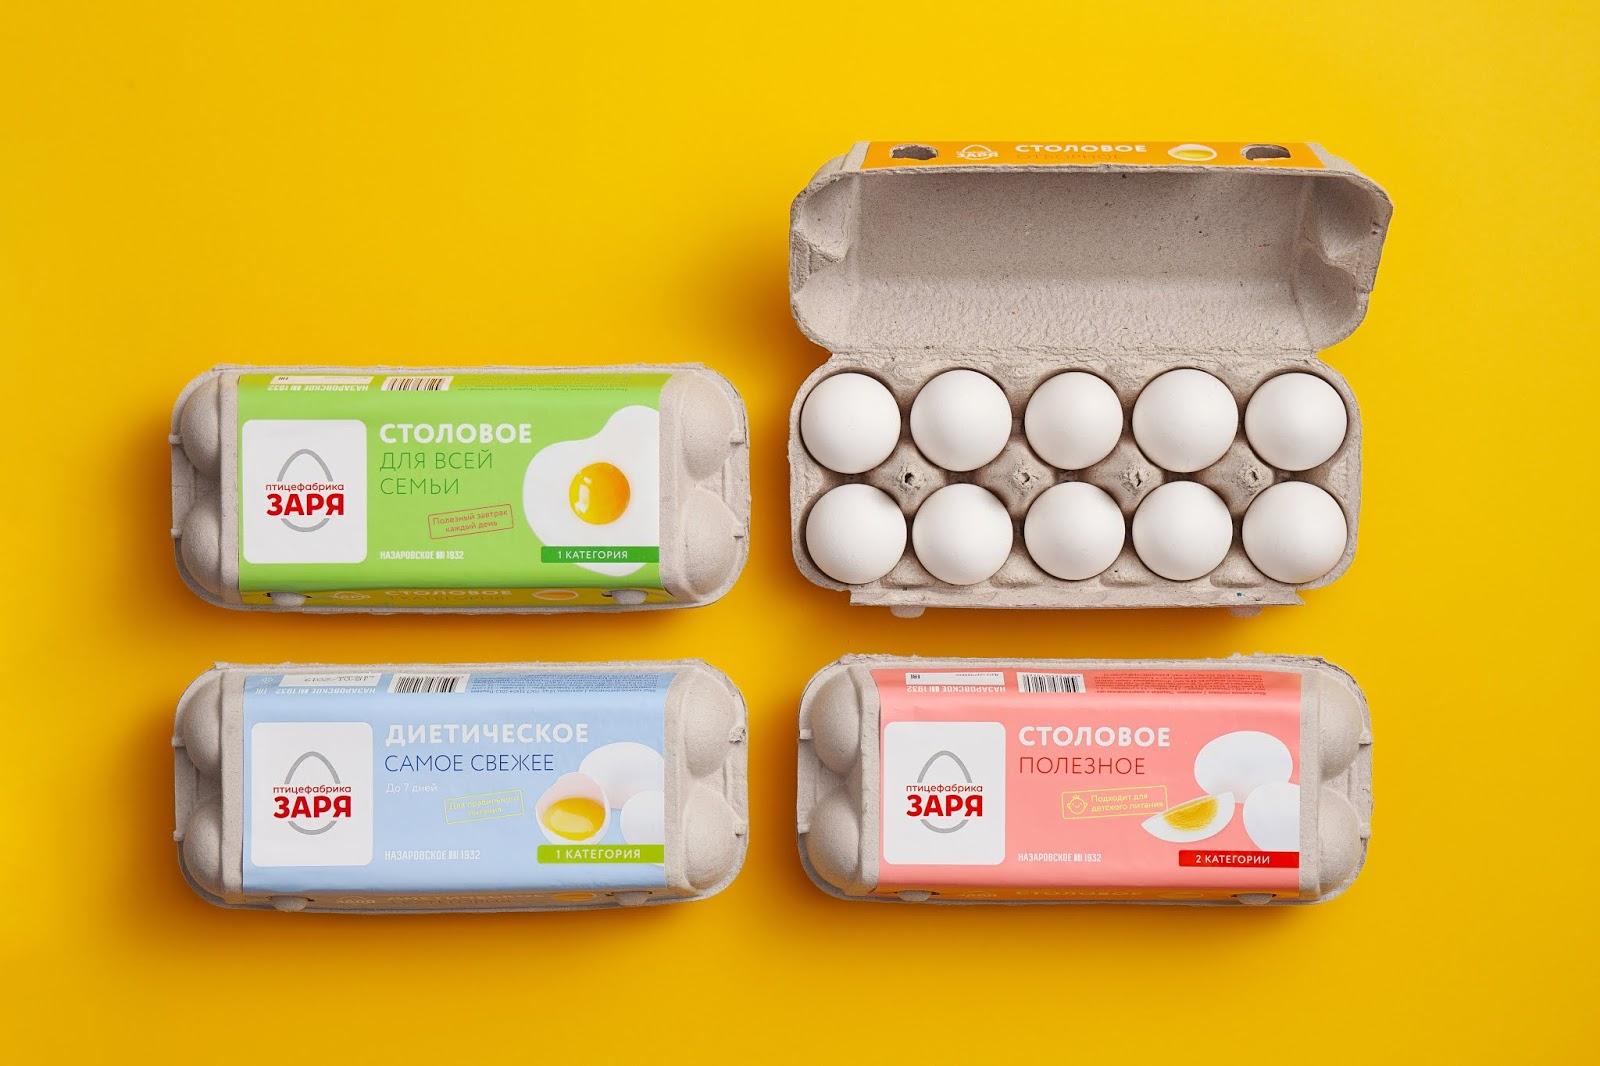 Zarya环保鸡蛋包装盒设计